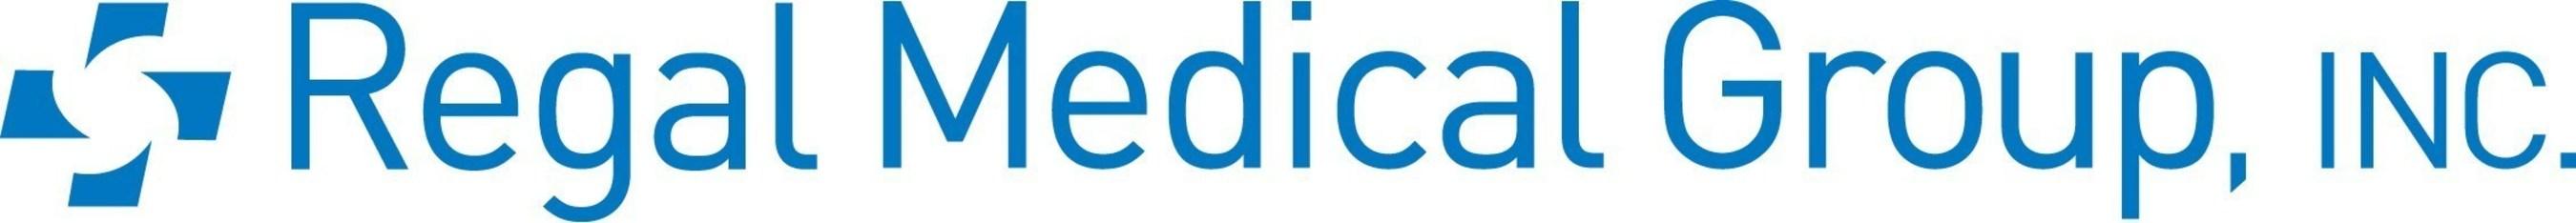 Regal Medical Group Logo